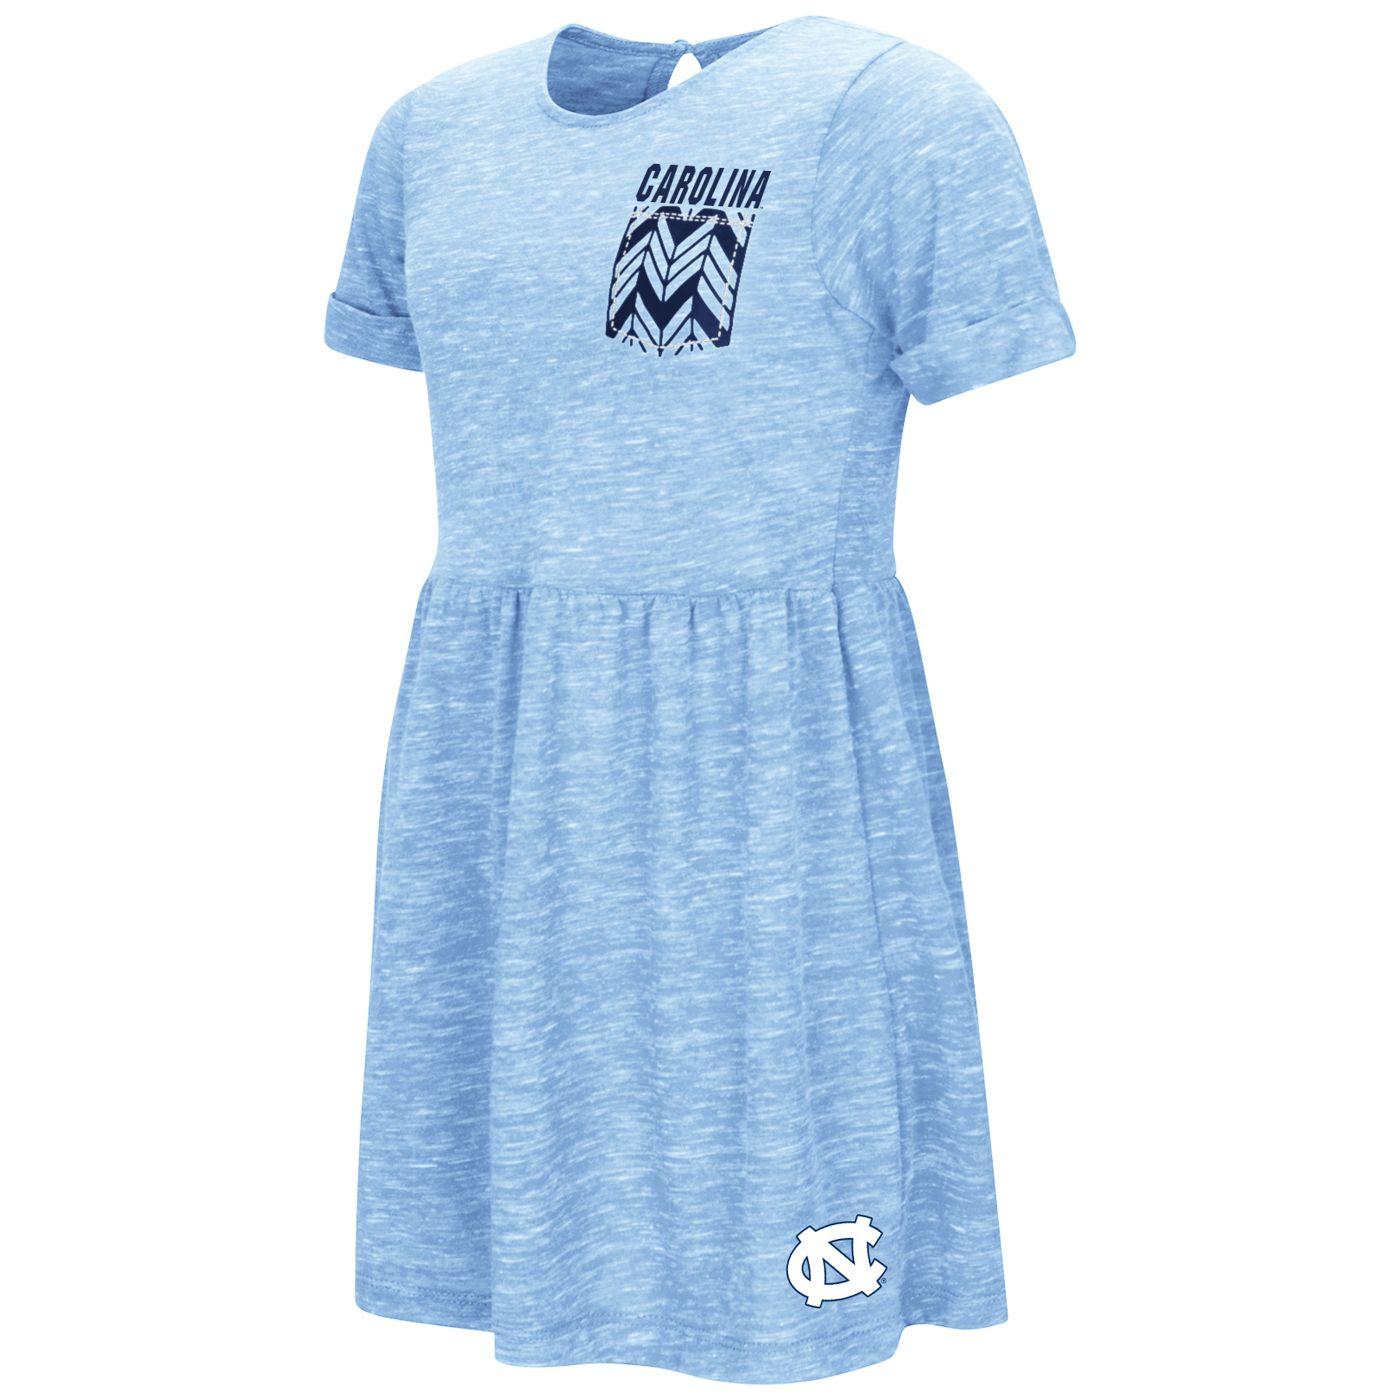 8ca208dea690 Johnny T-shirt - North Carolina Tar Heels - Youth Girls  Warm Up ...